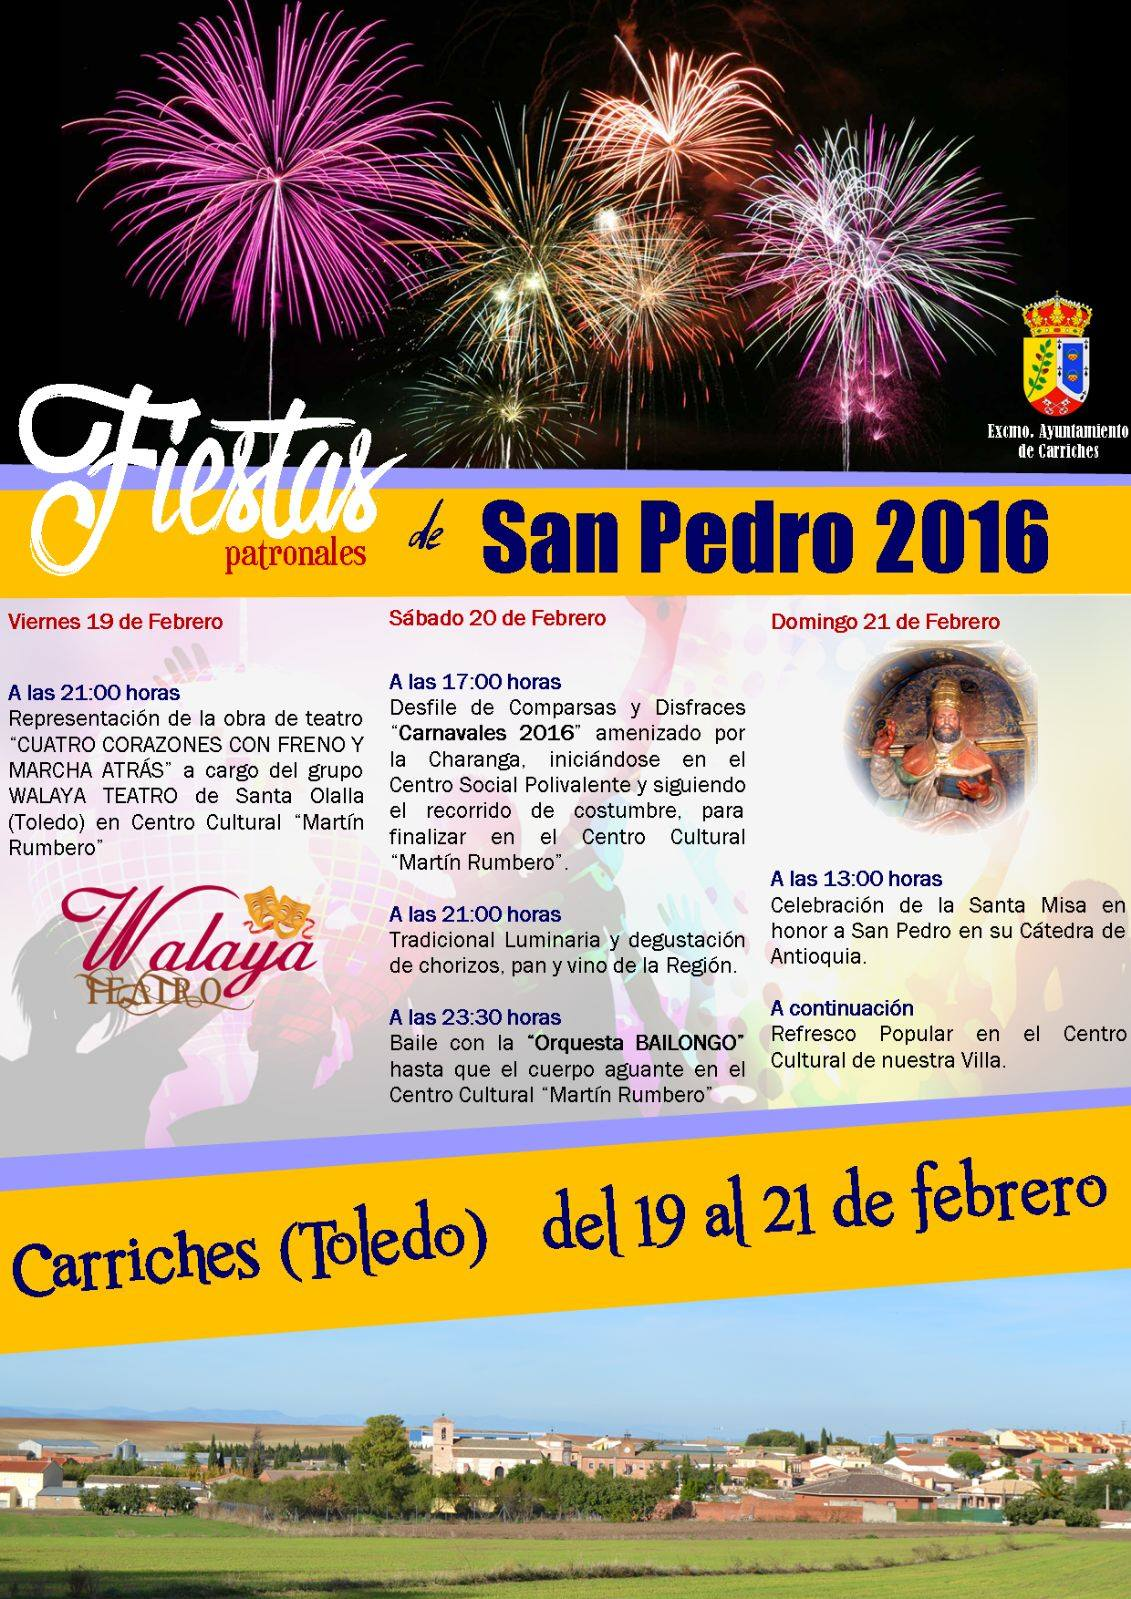 Fiestas de carriches en honor de la c tedra de san pedro for Jardin antioquia fiestas 2016